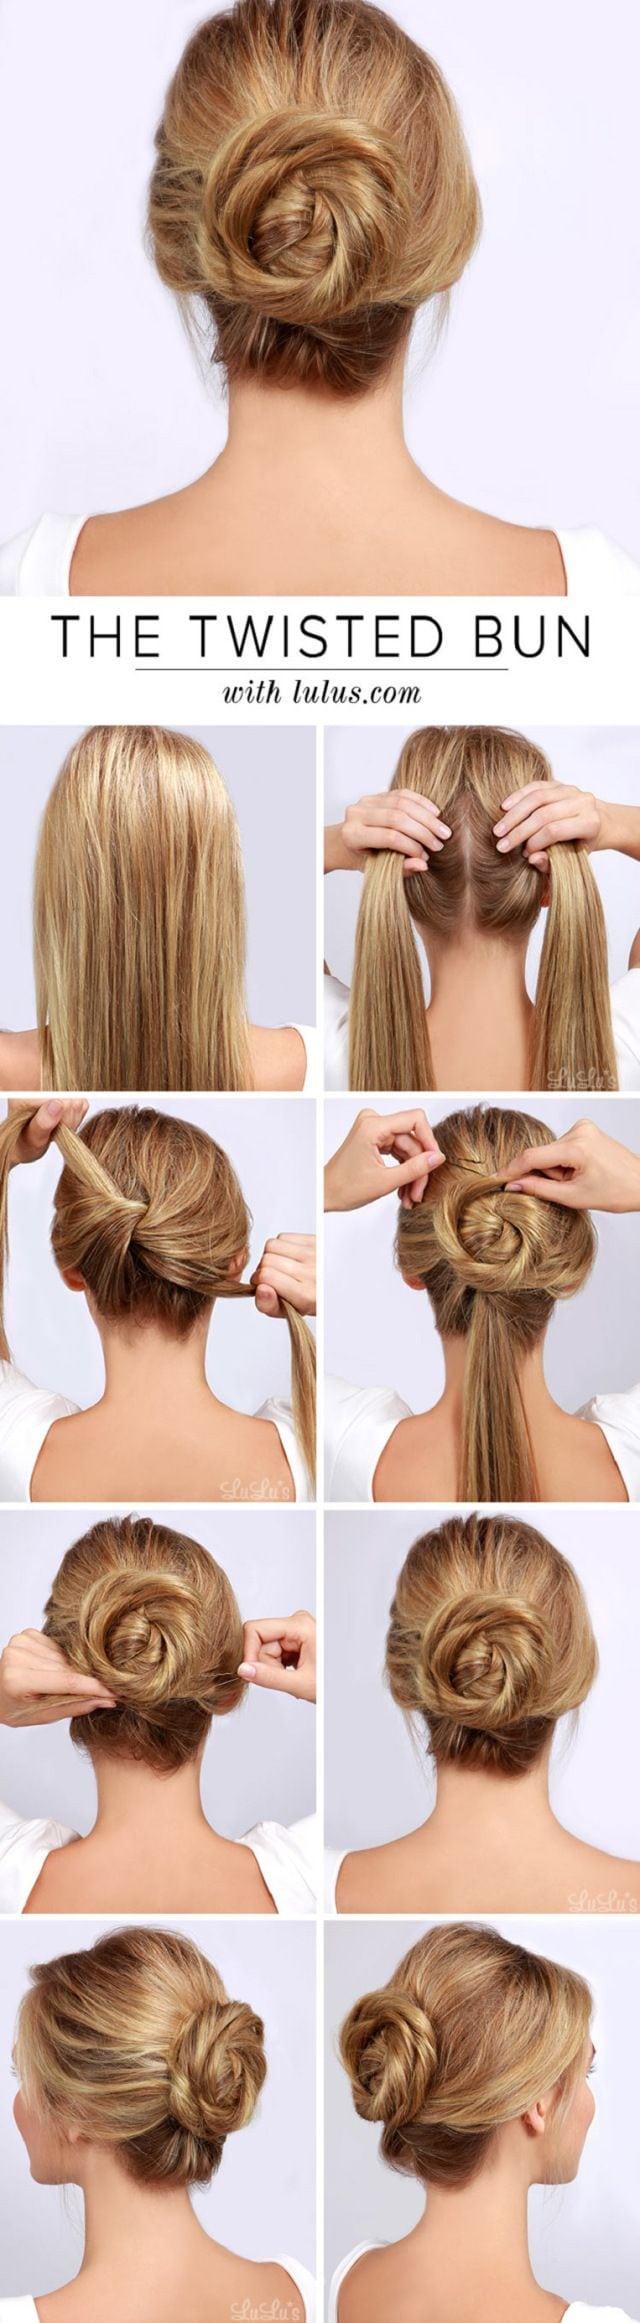 Twisted Bun Hair Tutorial | 12 Best Beauty Tutorials for Fall 2014 www.jexshop.com/ Source by margrietje01   …